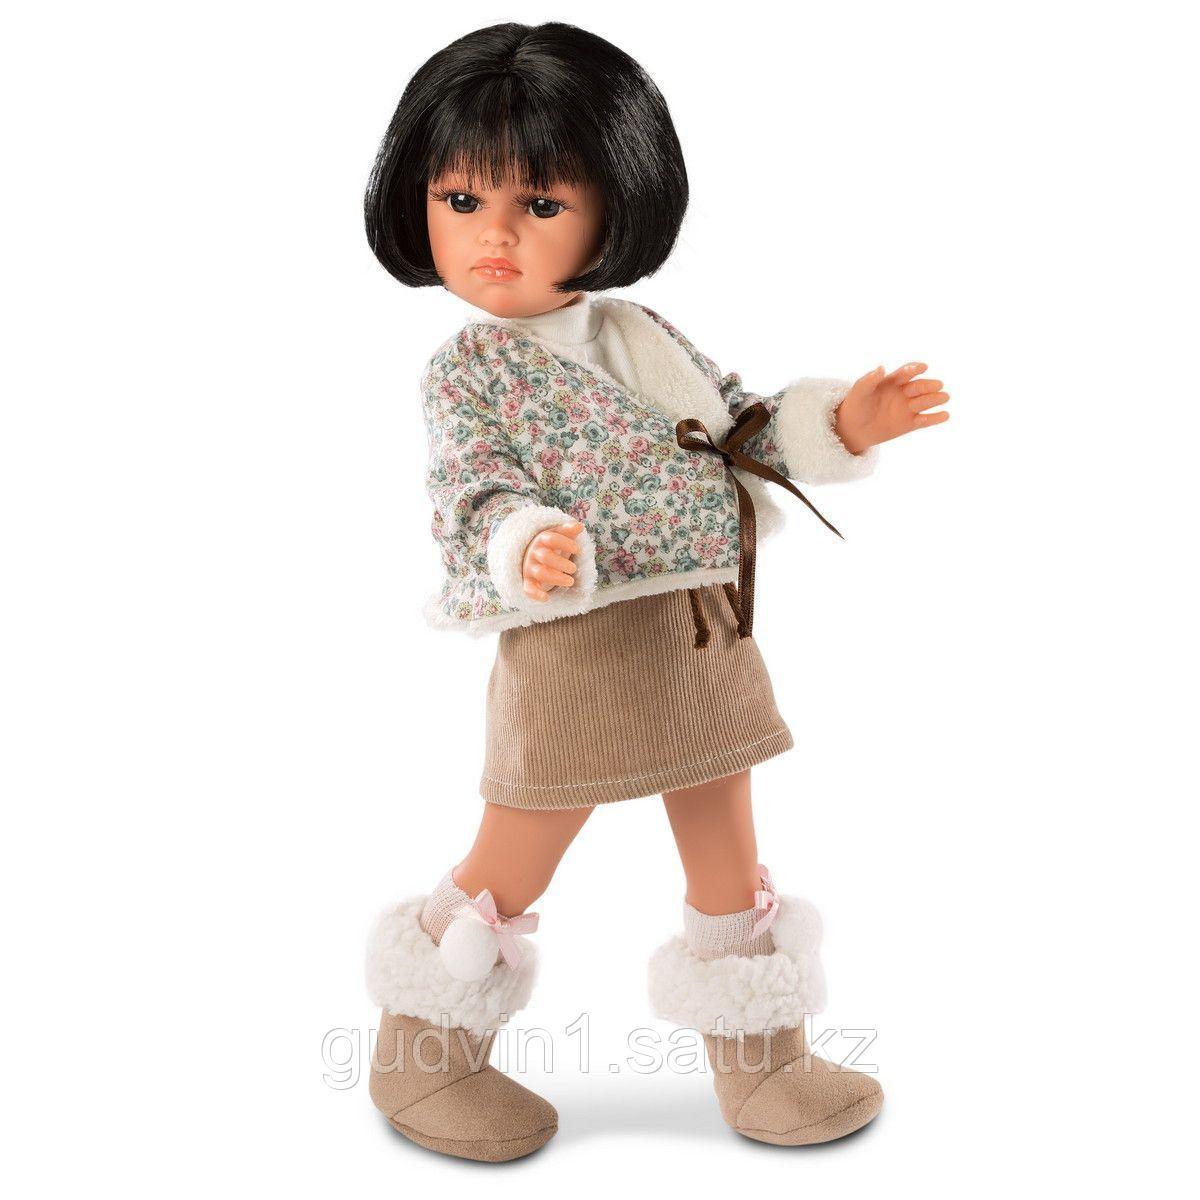 LLORENS: Кукла Оливия 37см, брюнетка 53701